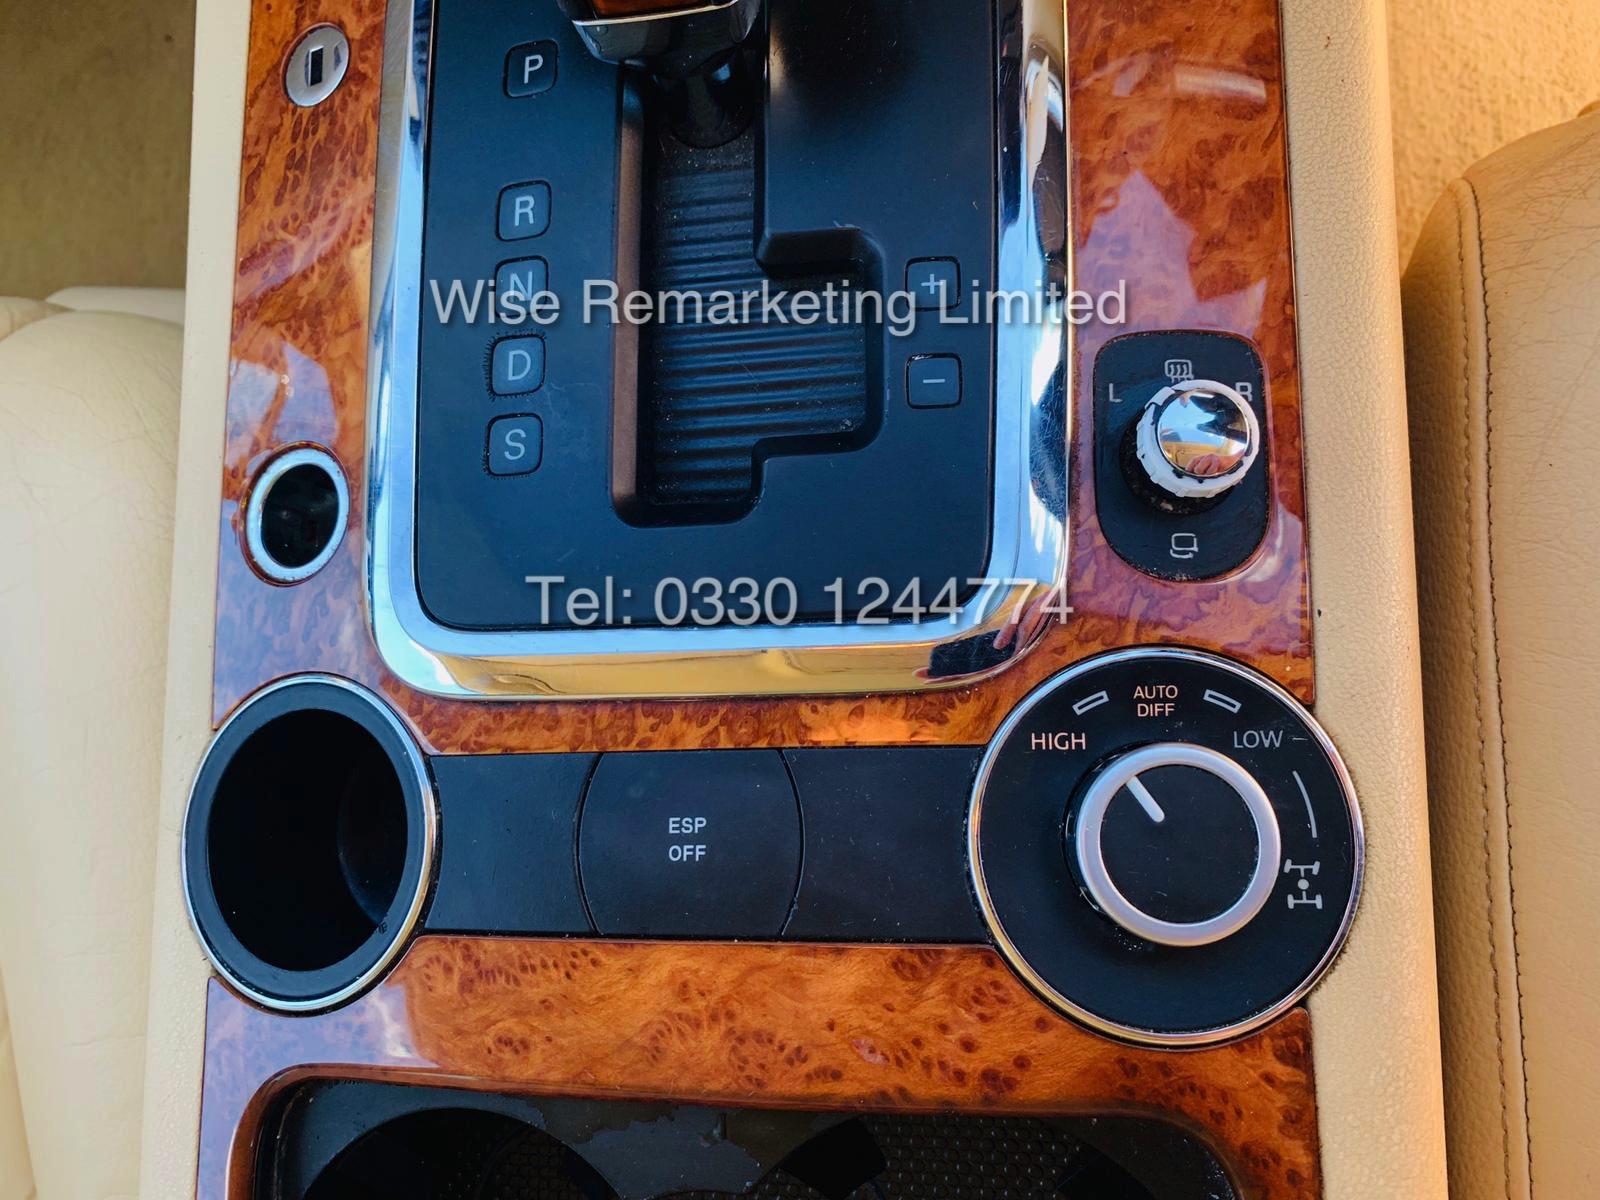 VOLKSWAGEN TOUAREG 2.5 TDI SPORT AUTO 2004 REG 4x4 BLACK - CREAM LEATHER - Image 12 of 24